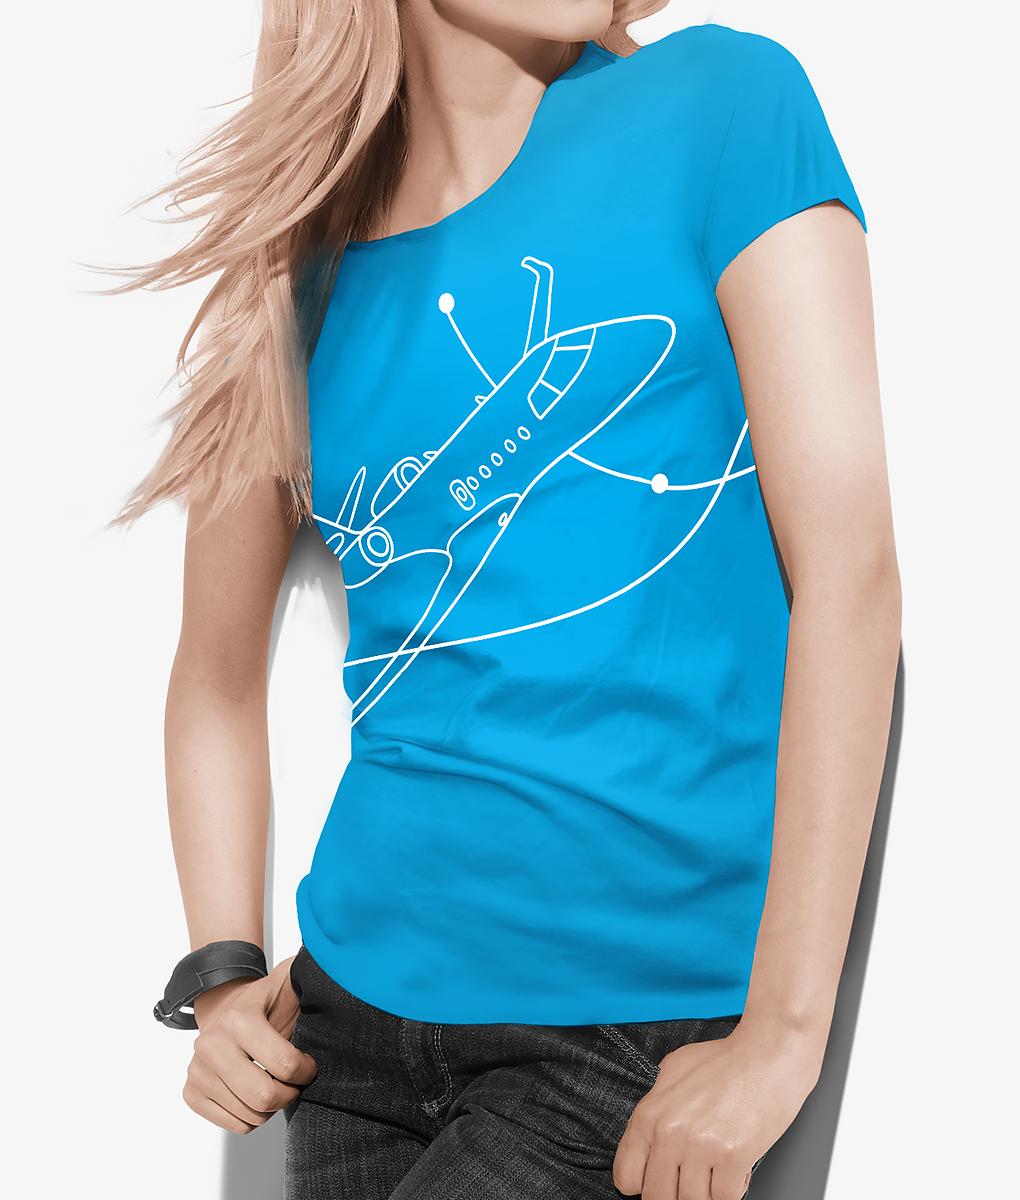 t-shirt_woman_2